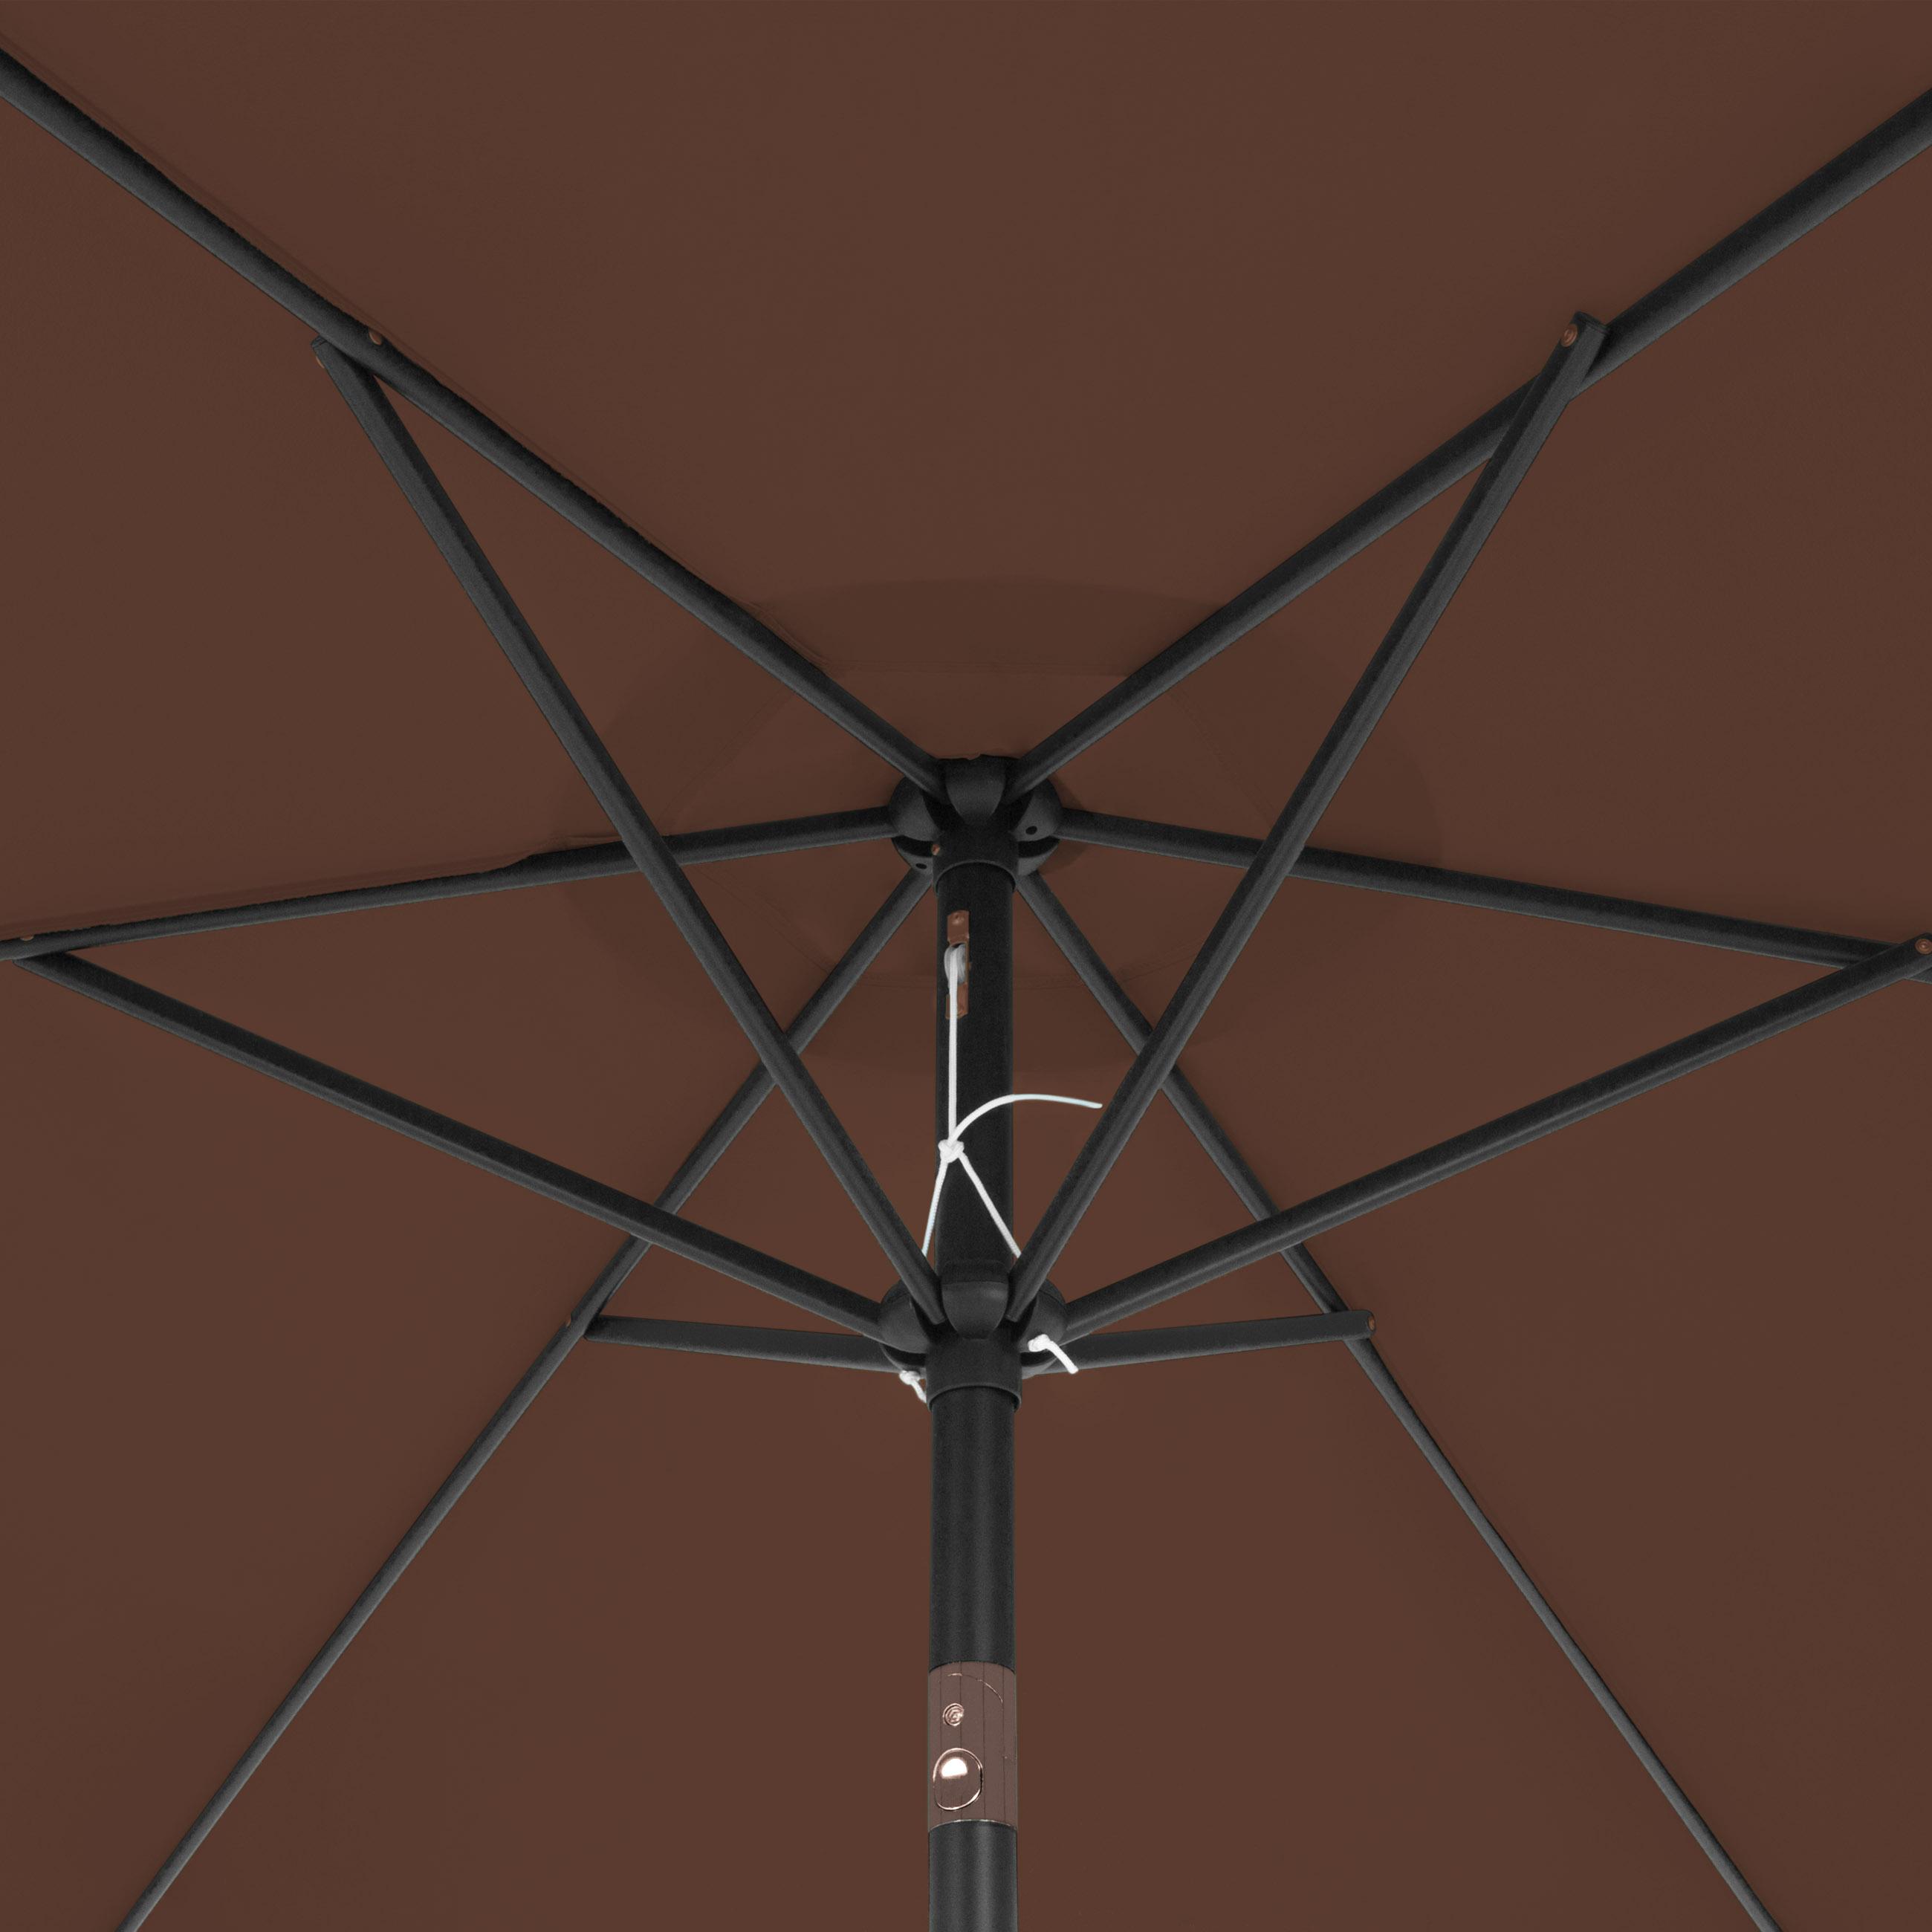 BCP-10ft-Outdoor-Steel-Market-Patio-Umbrella-Decoration-w-Tilt-Crank thumbnail 19